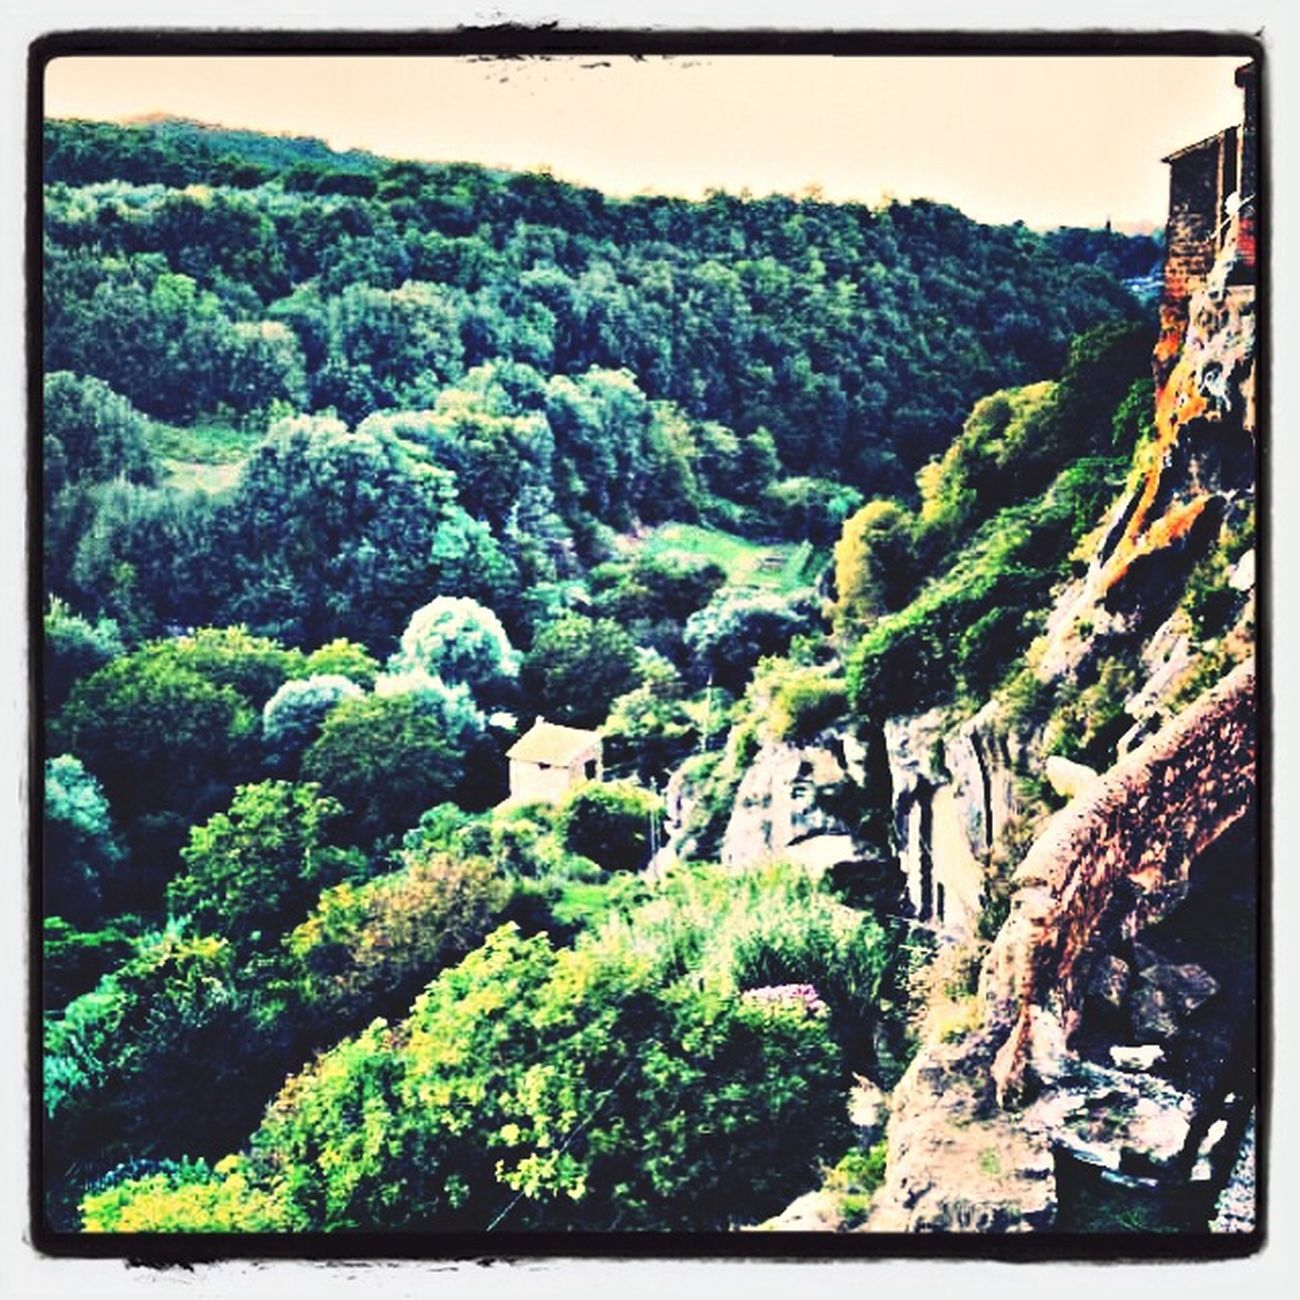 Italy Enjoying Life Calm Nature